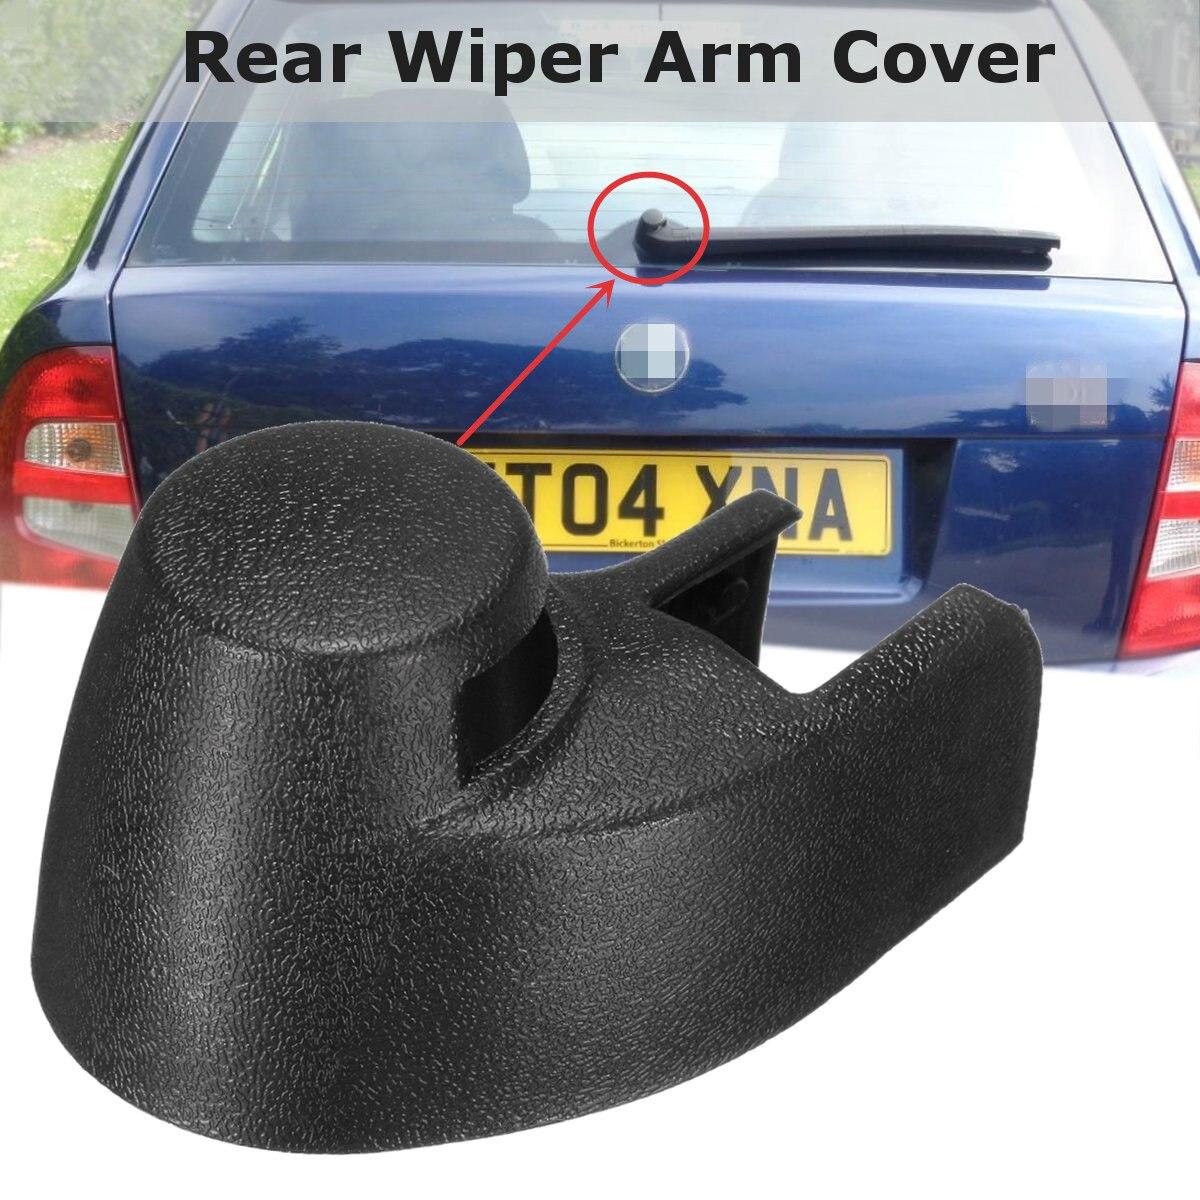 Negro limpiaparabrisas trasero para coche lavadora brazo tuerca tapa para Skoda Faiba 1999-2008 6Y6955435